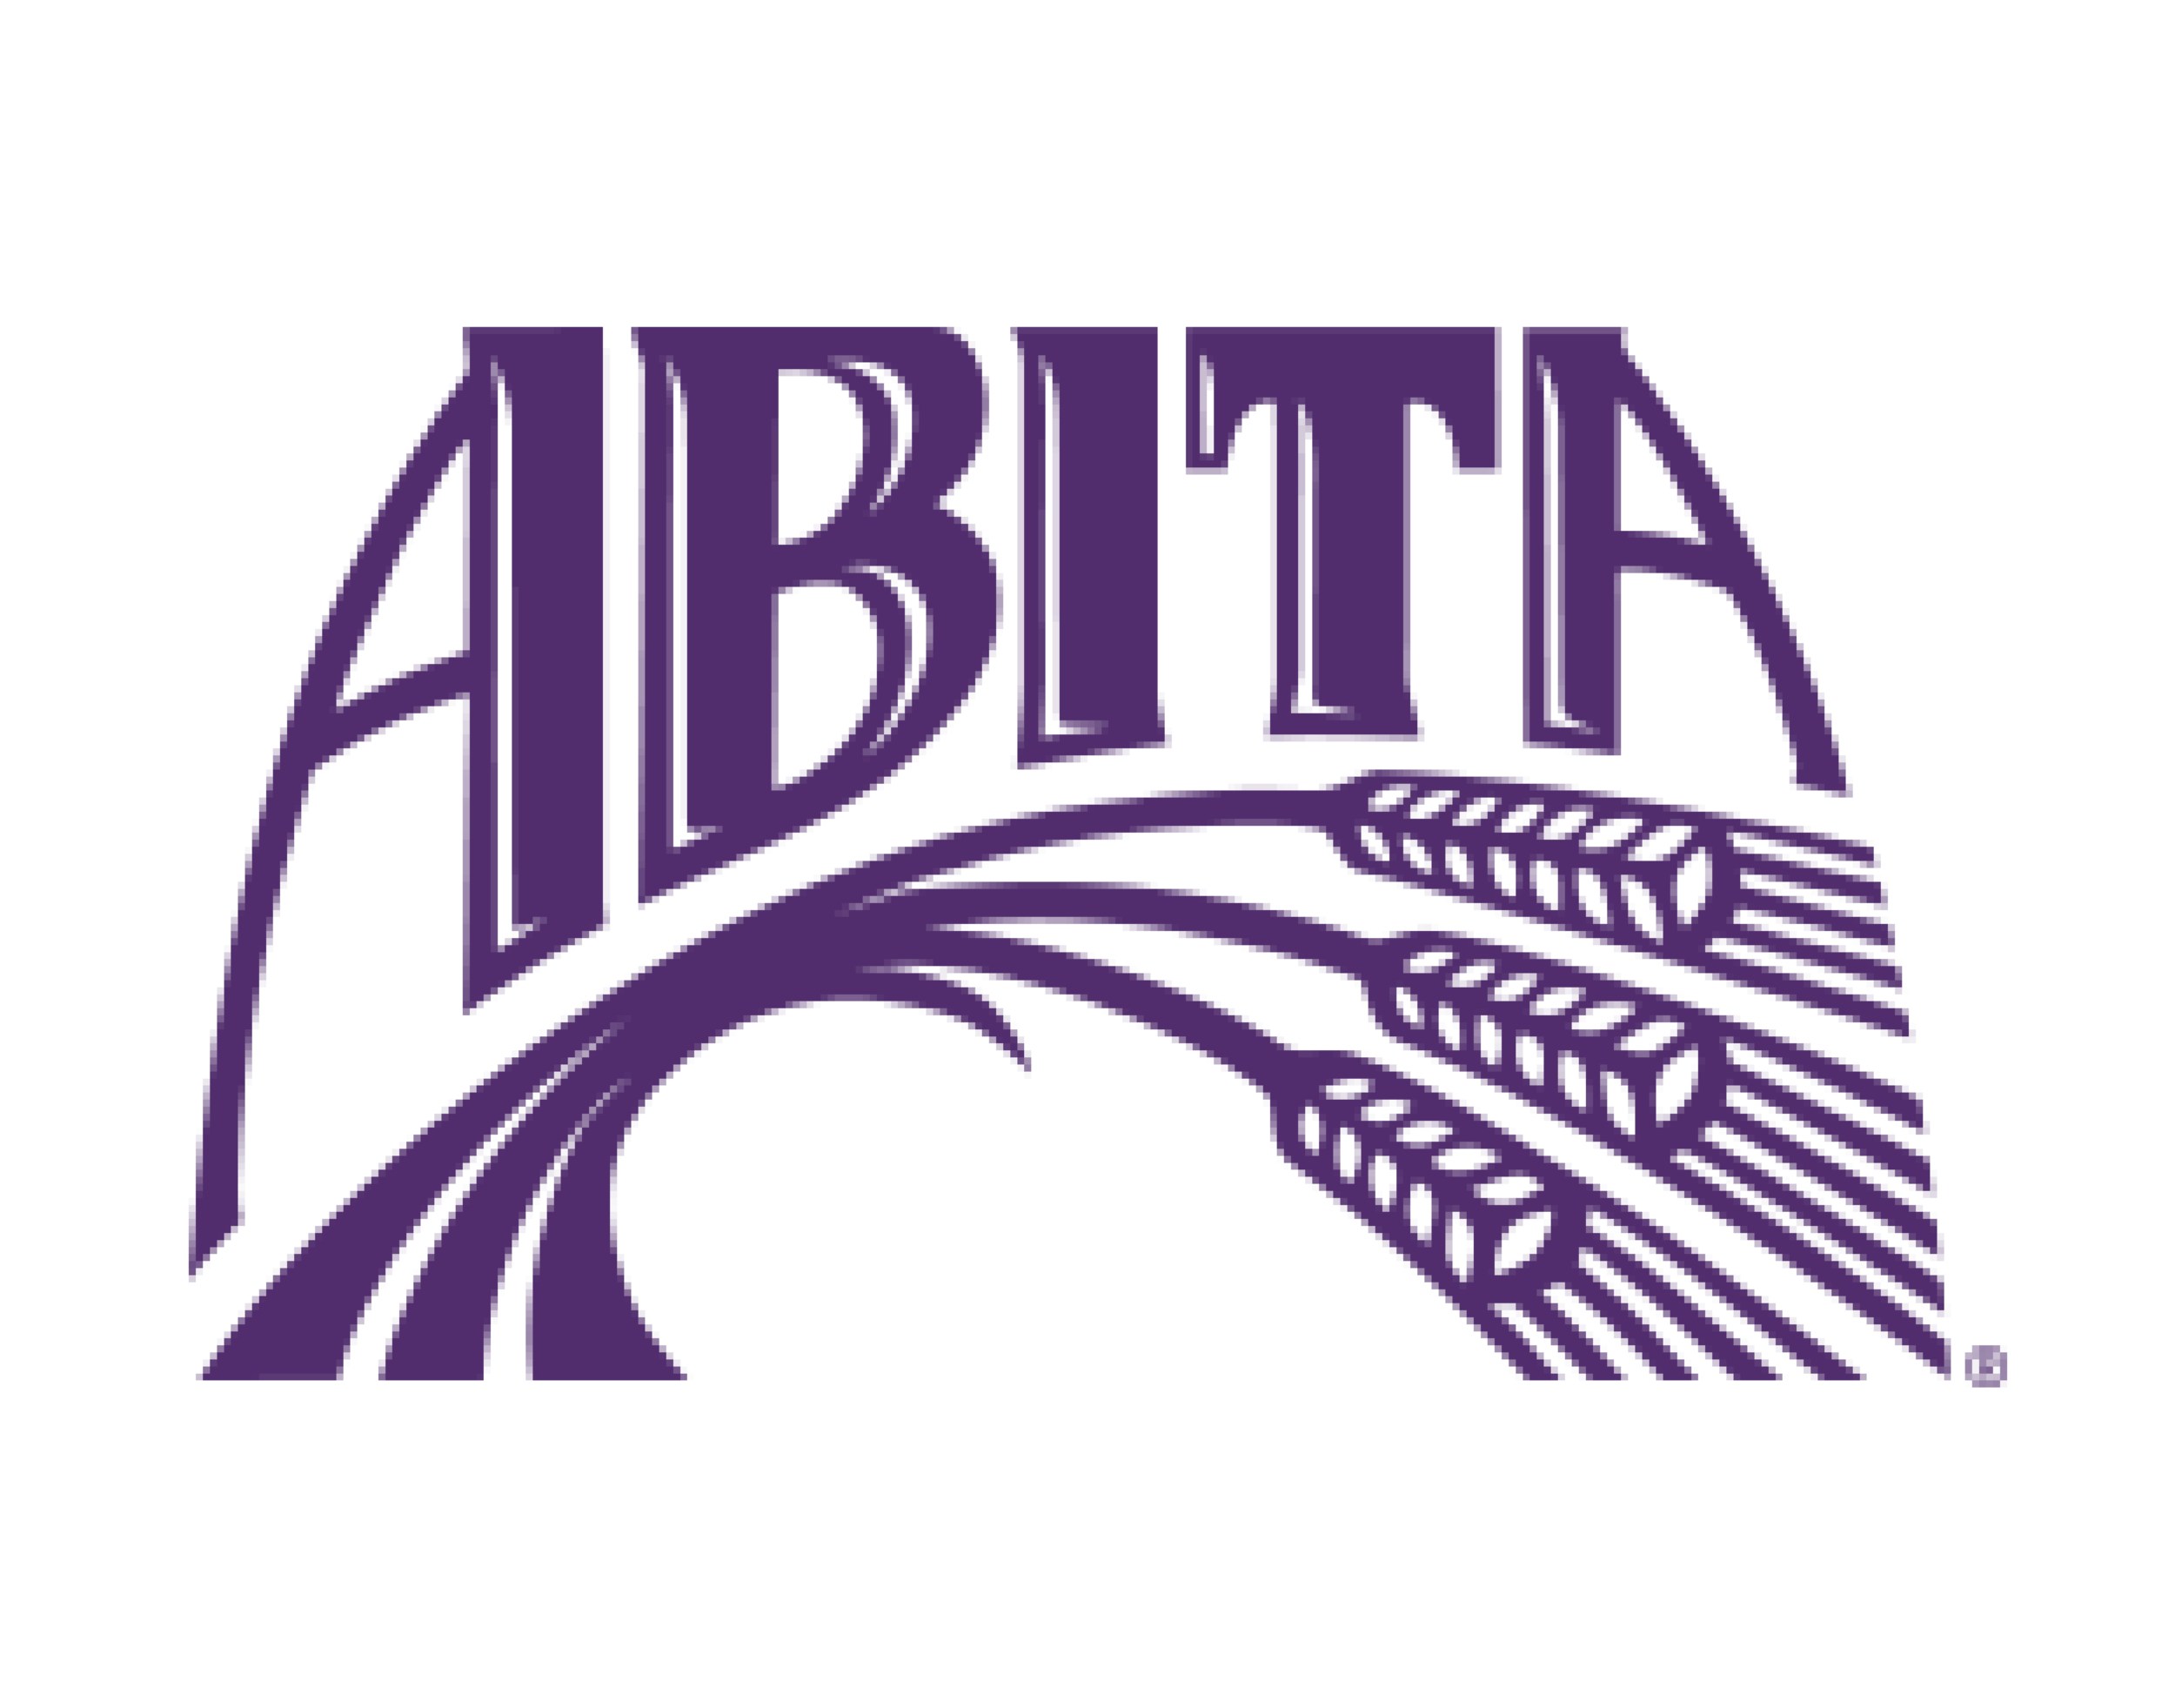 Abita logo. Links to Abita website.